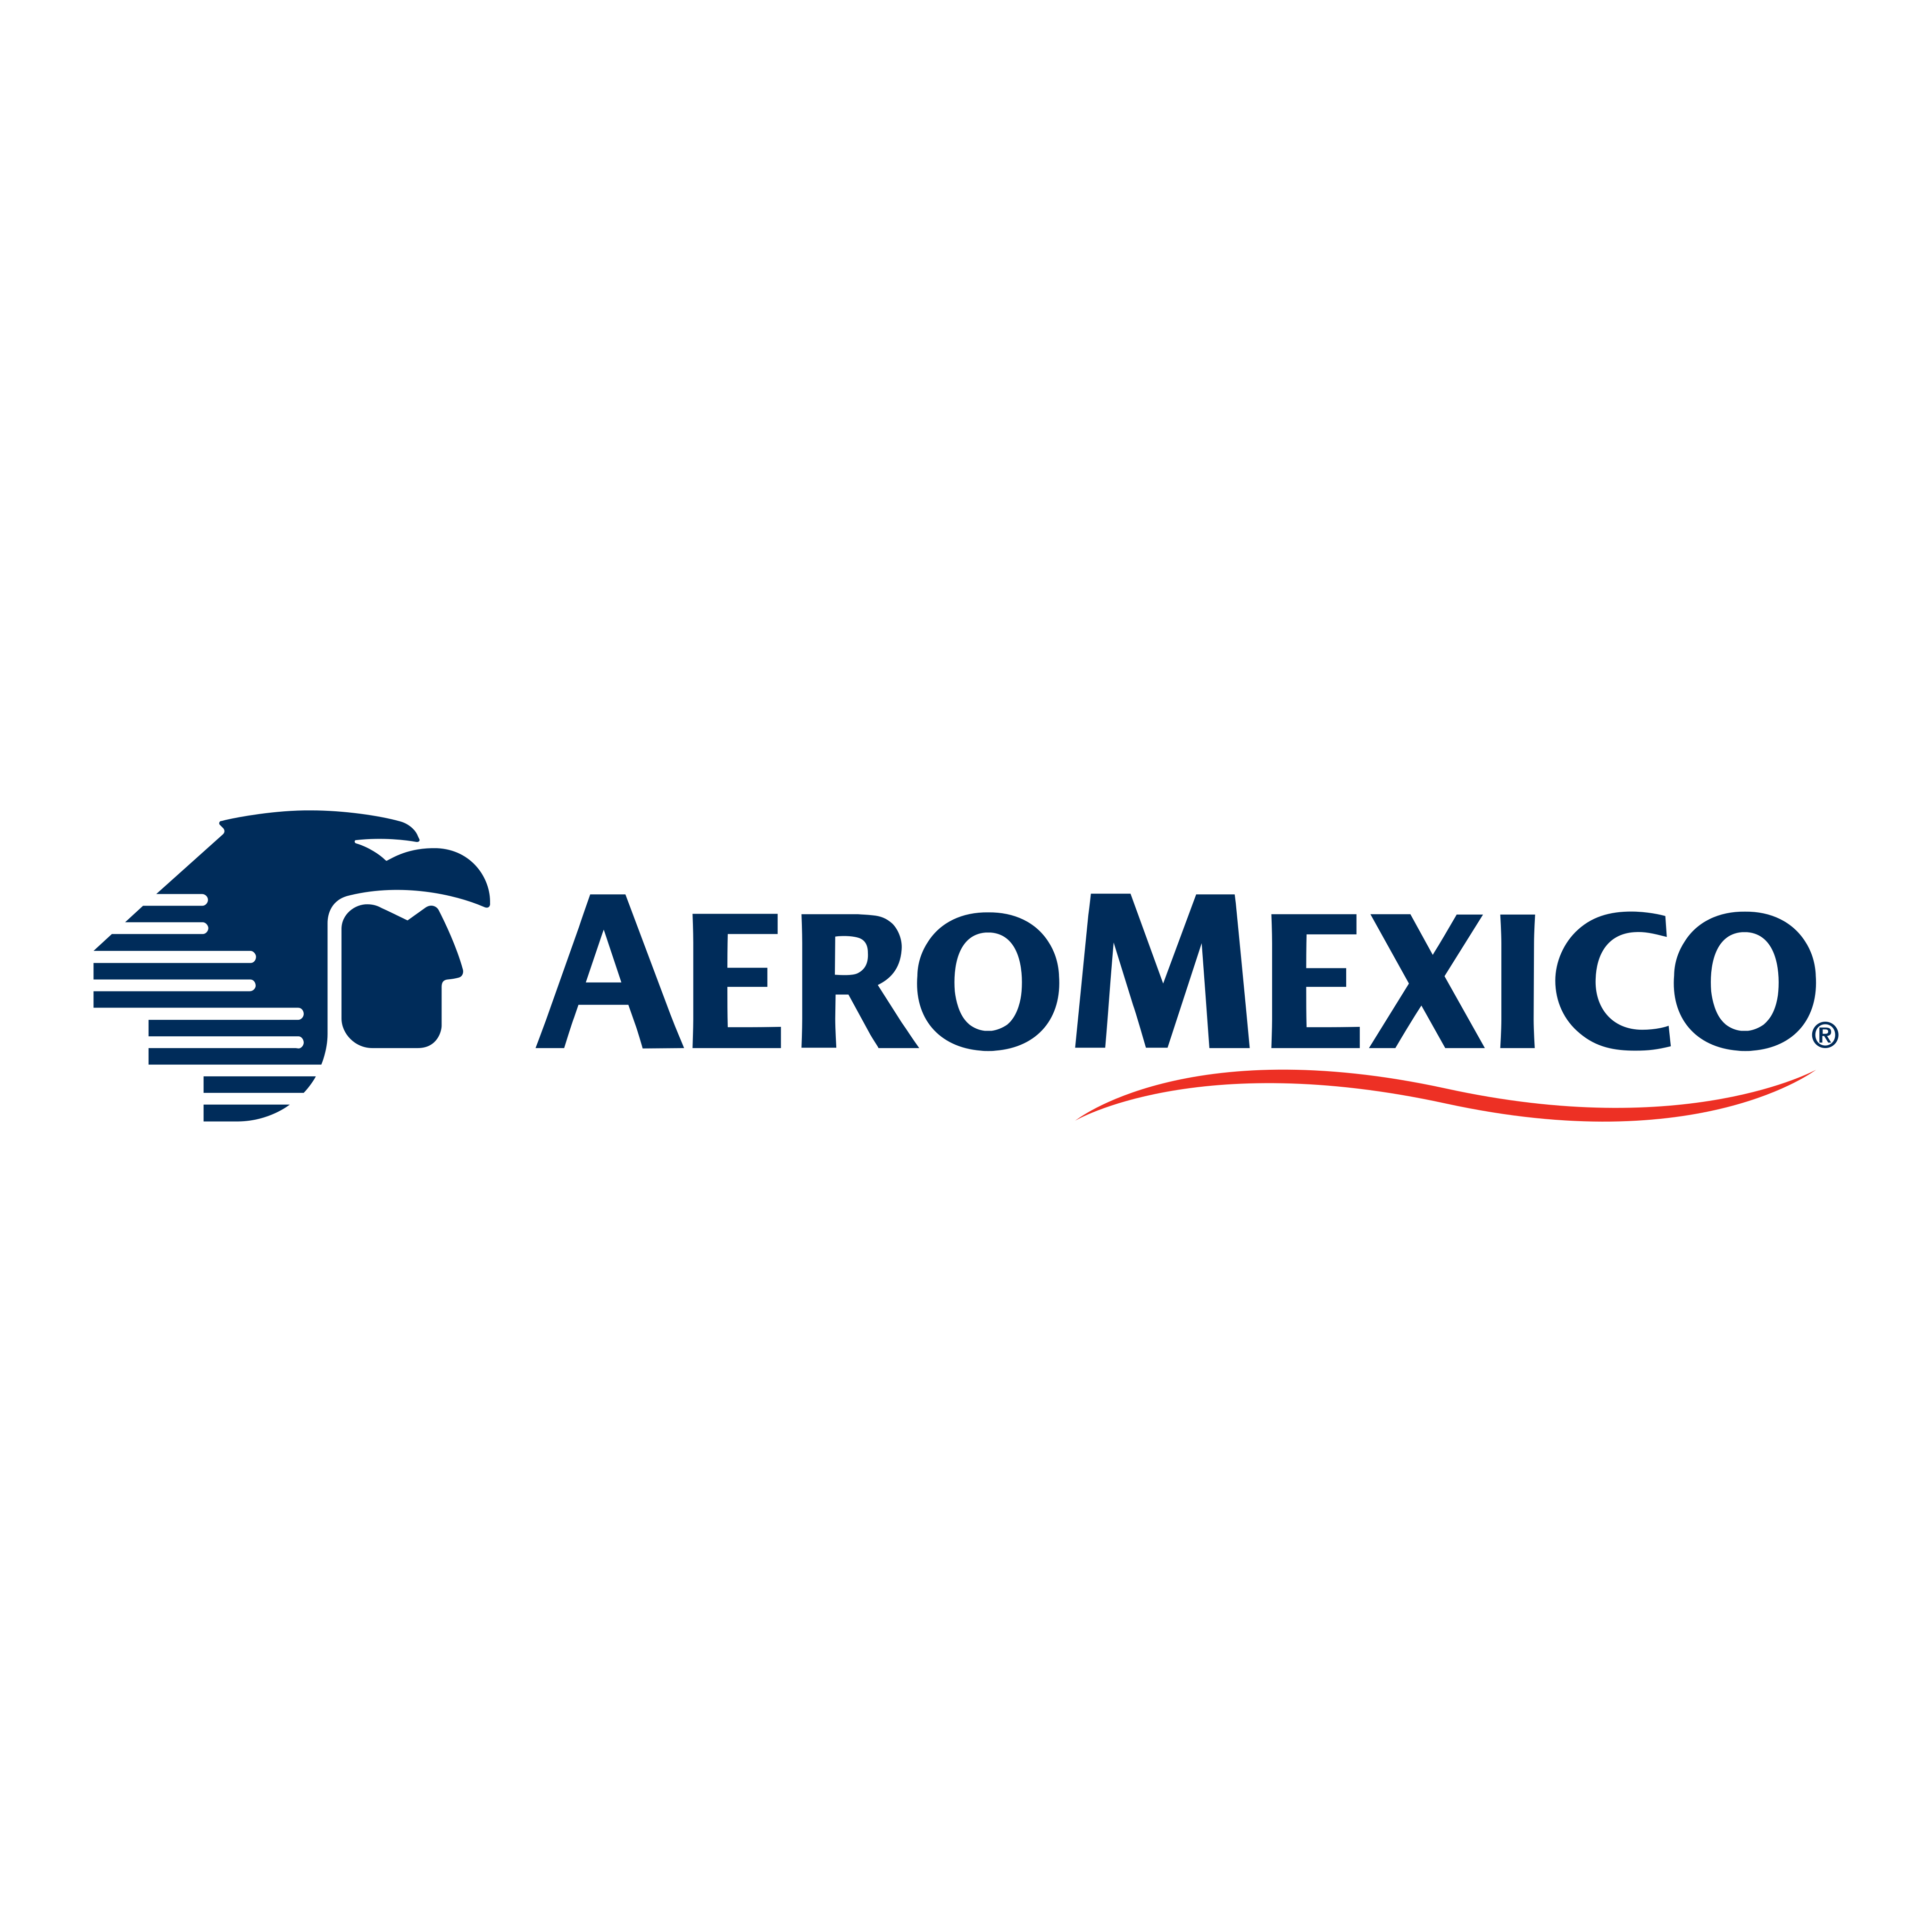 aeromexico-logo-0